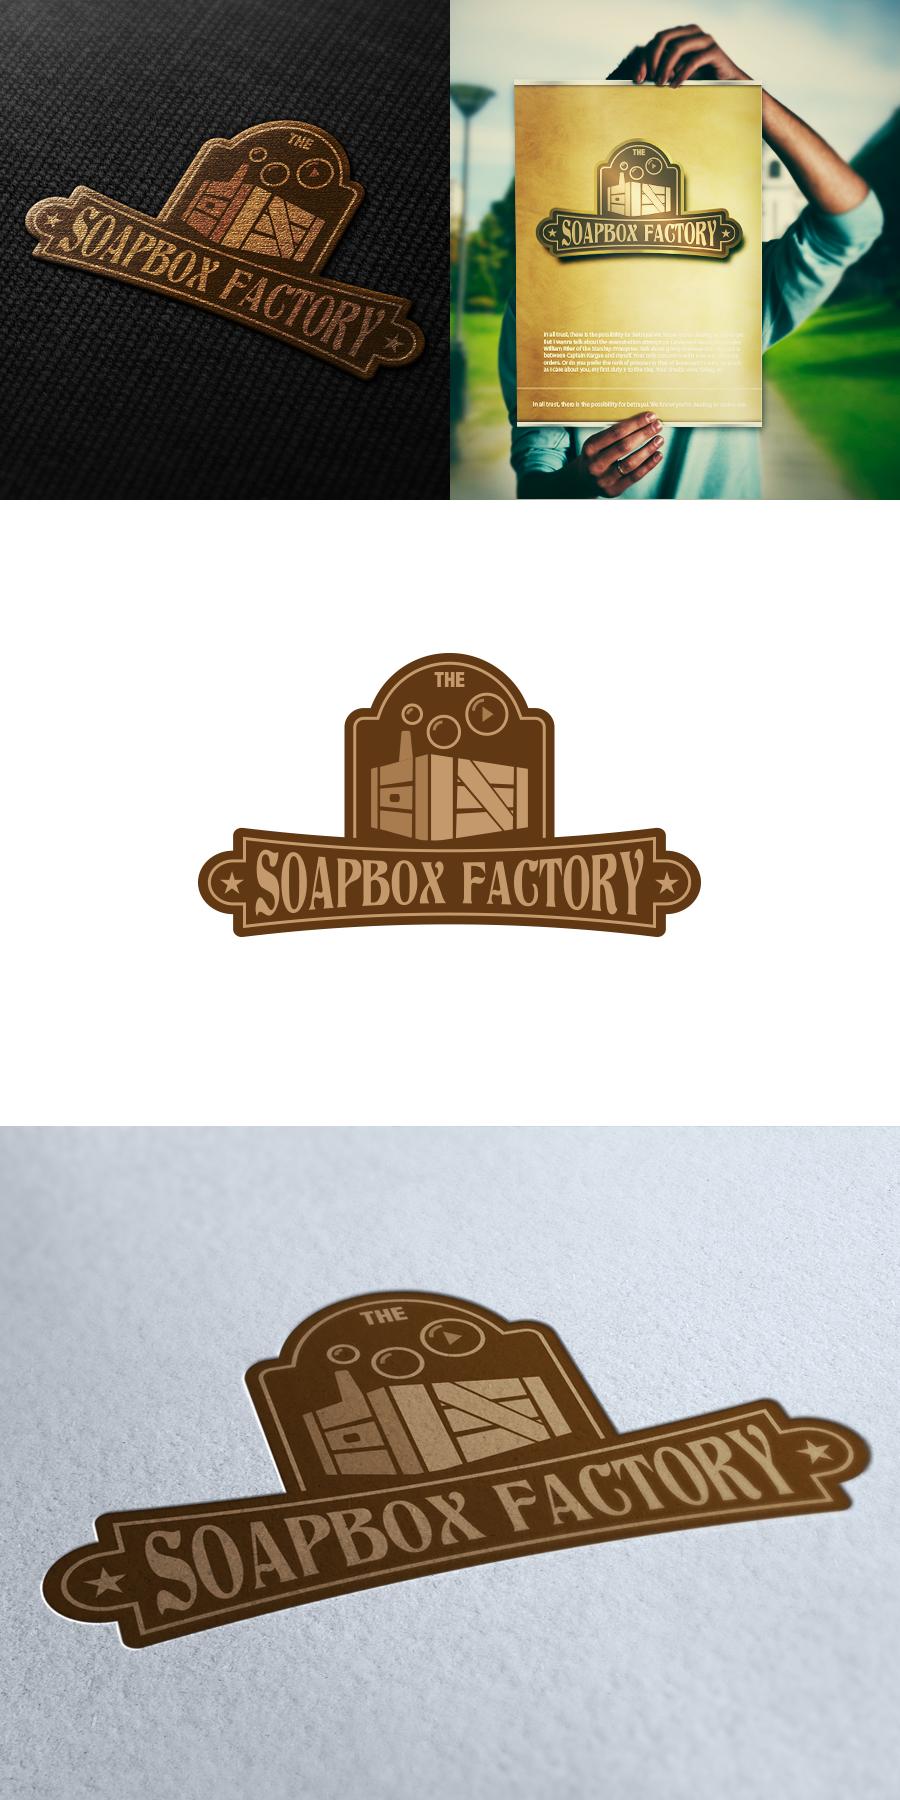 The Soapbox Factory needs a new logo